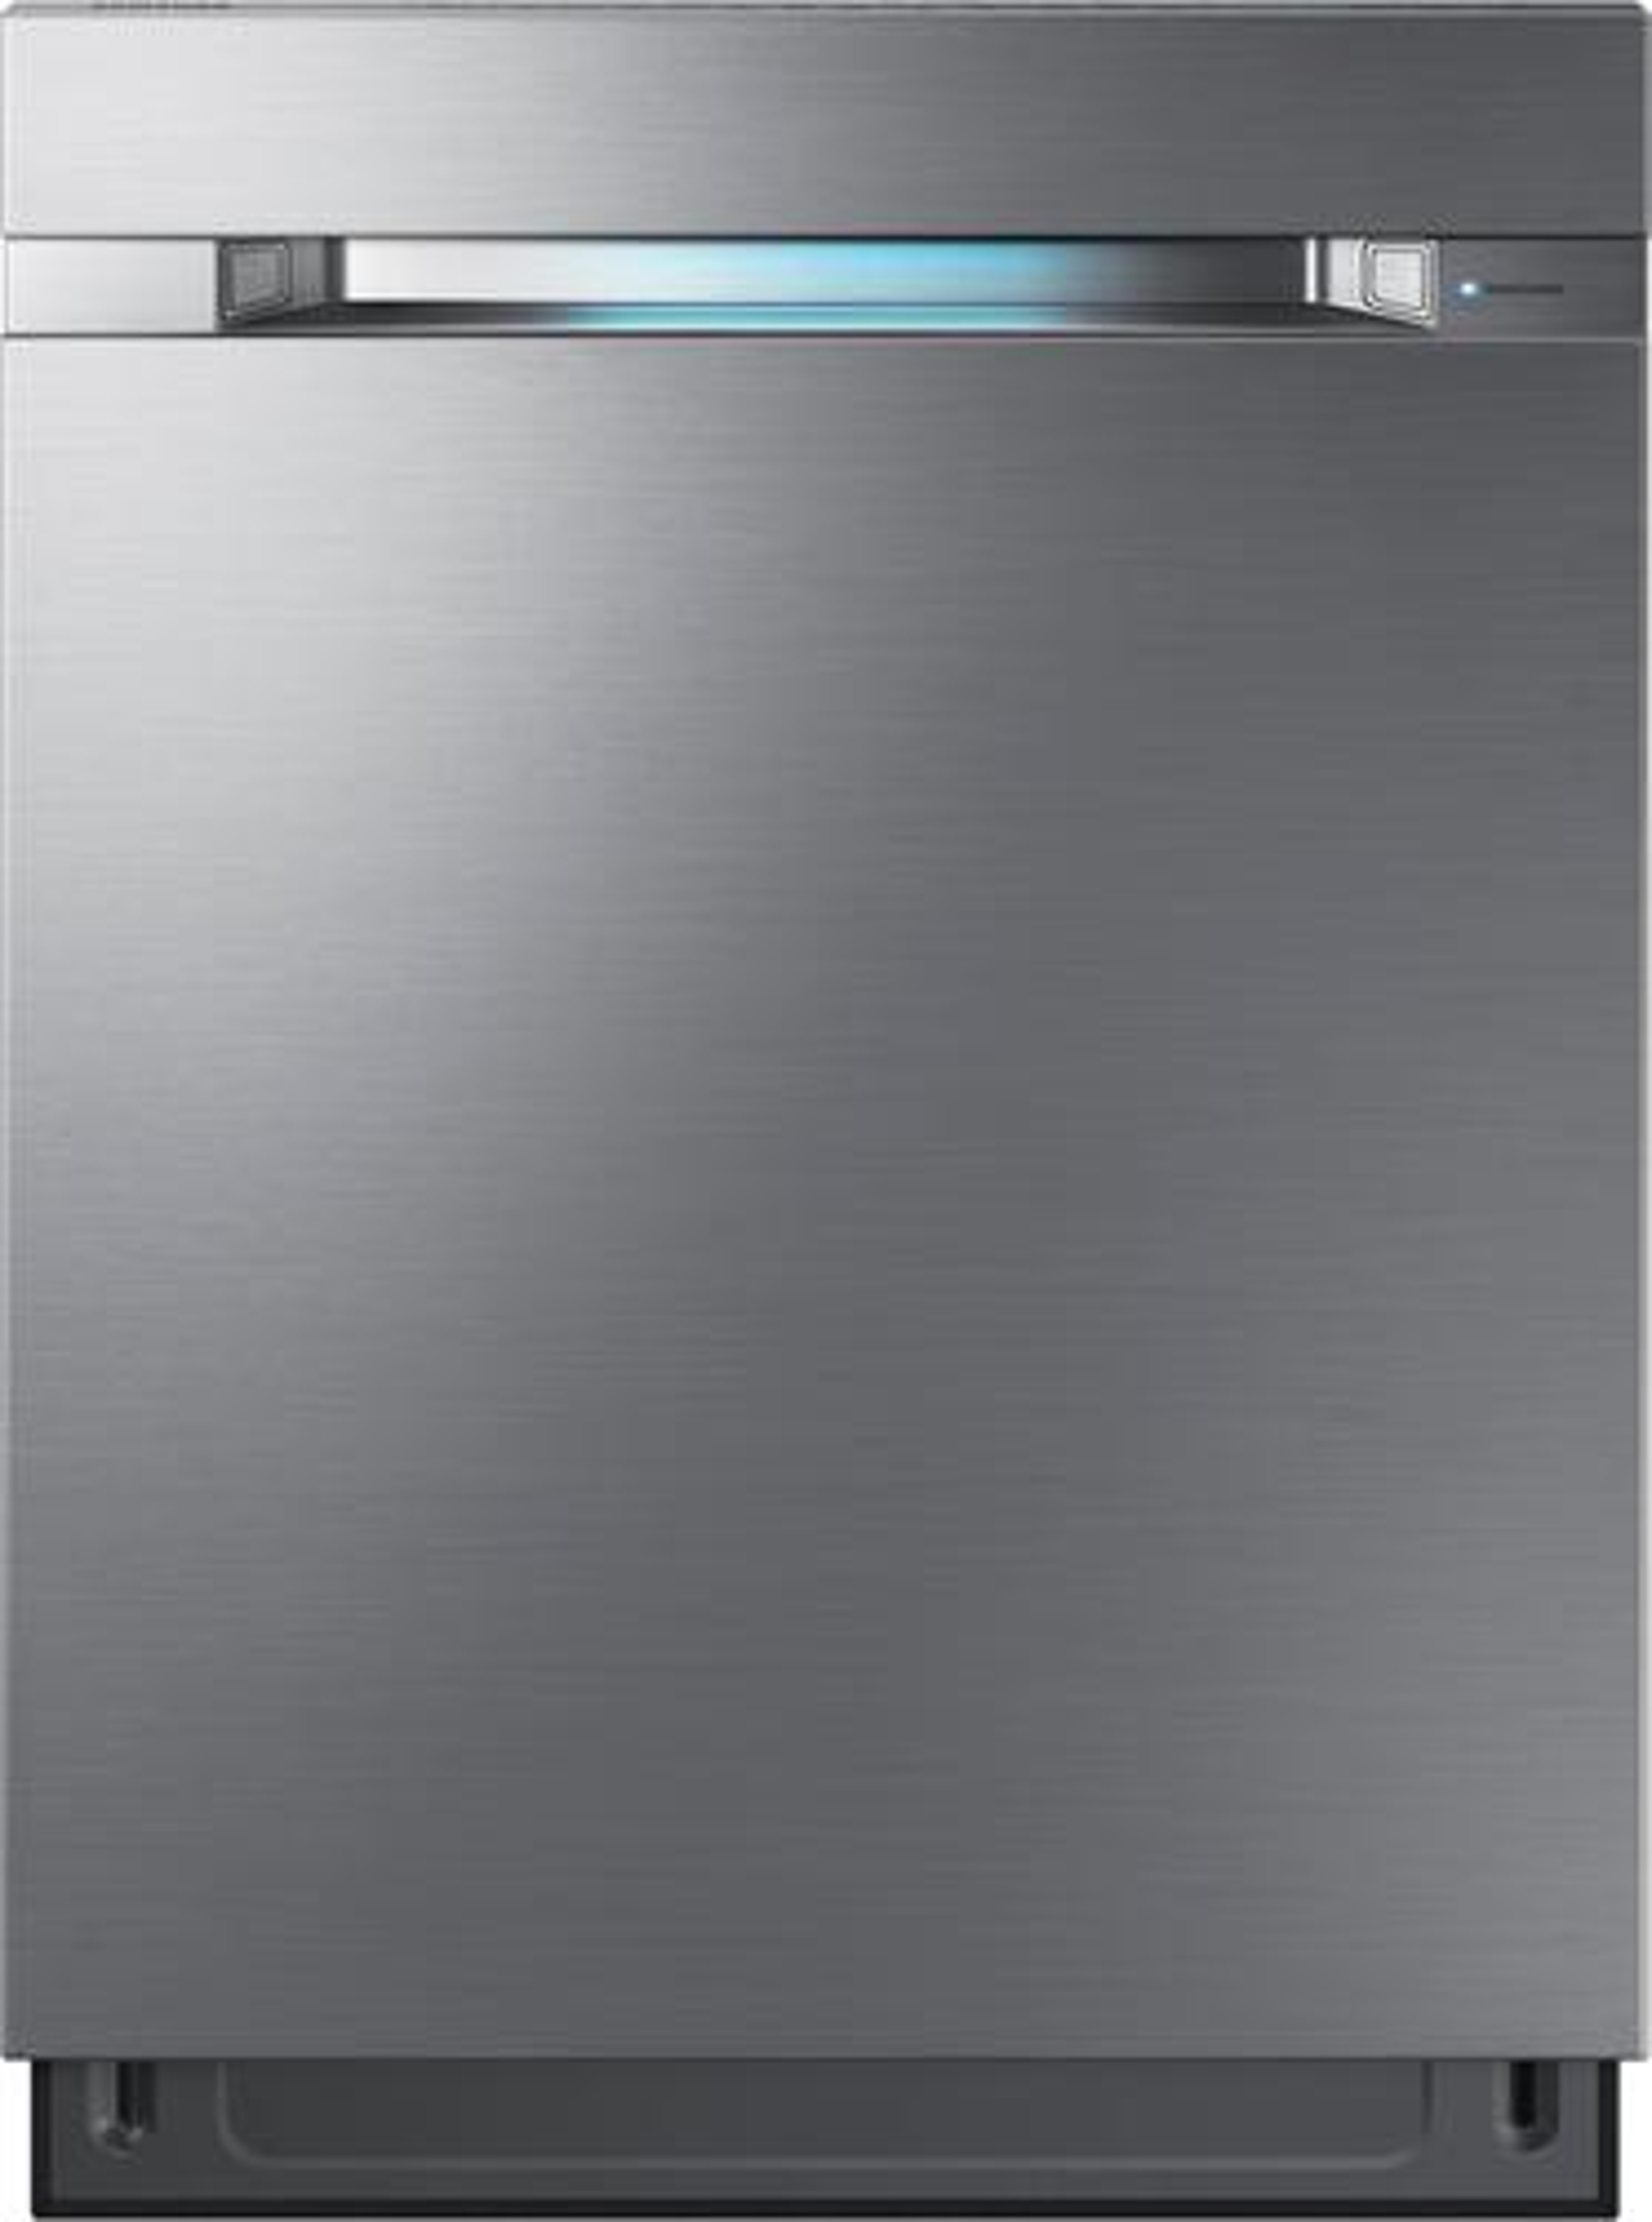 Samsung DW80M9960US